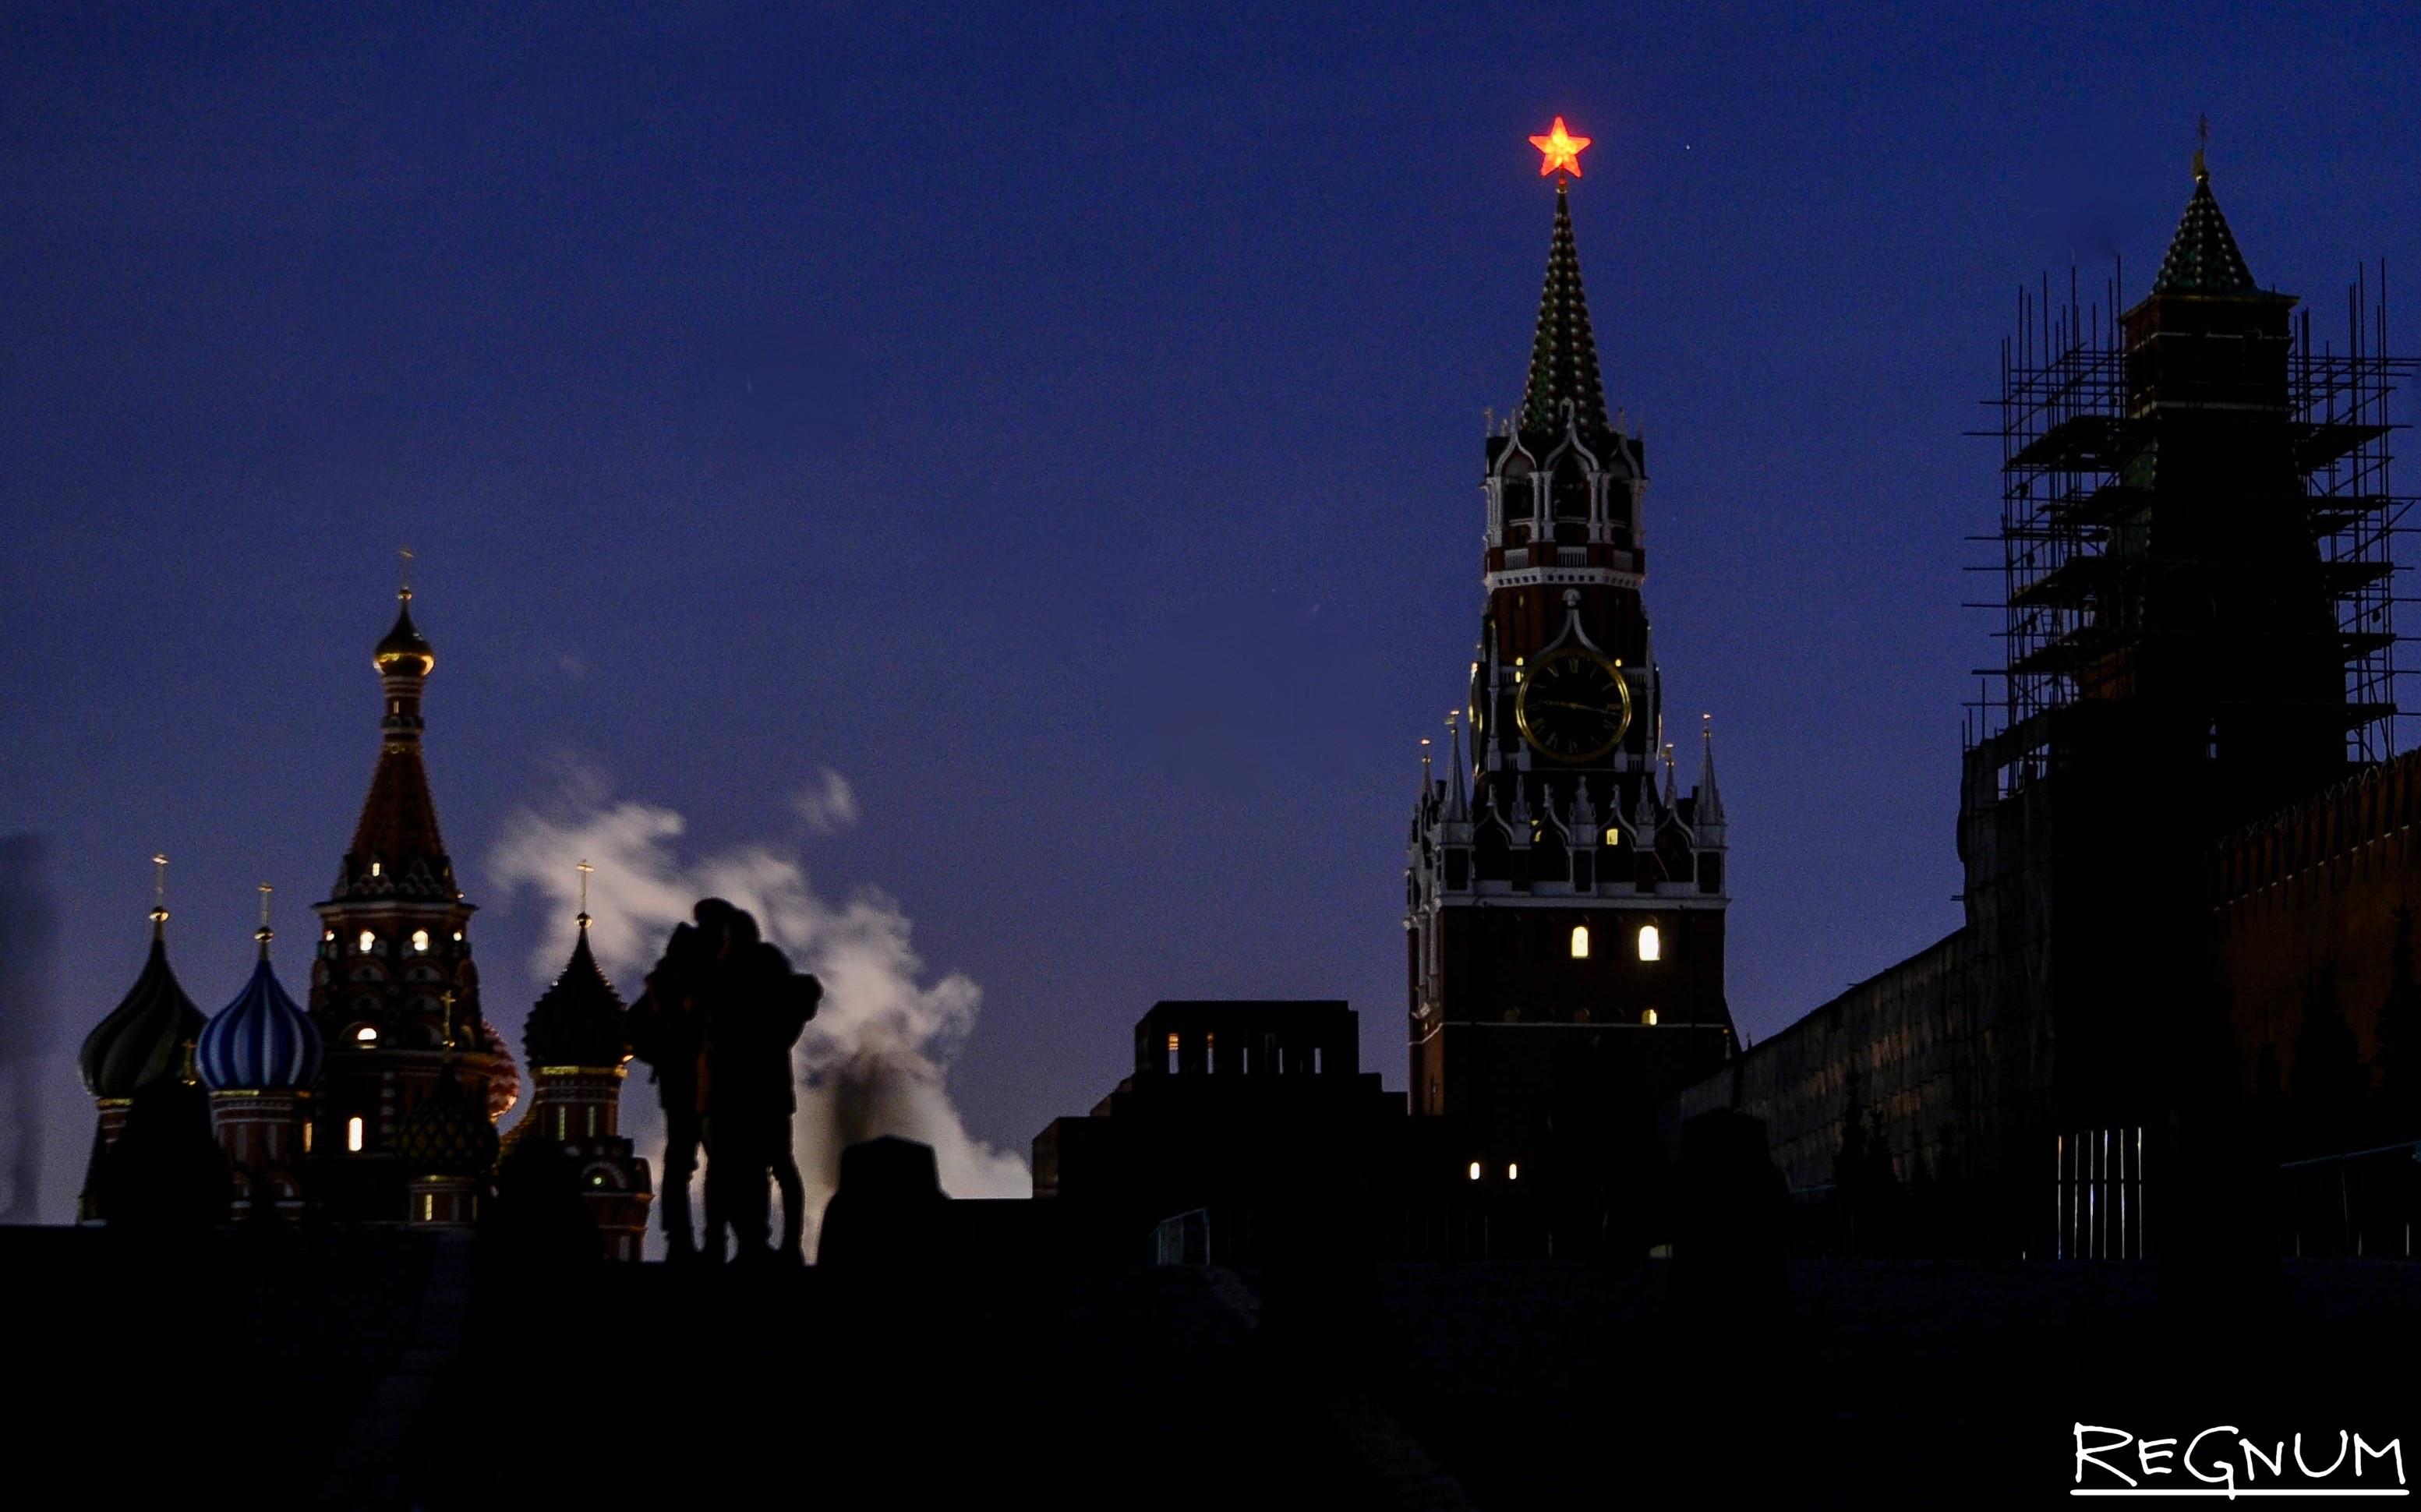 Час Земли Час Земли в Москве regnum picture 1460039350811420 normal